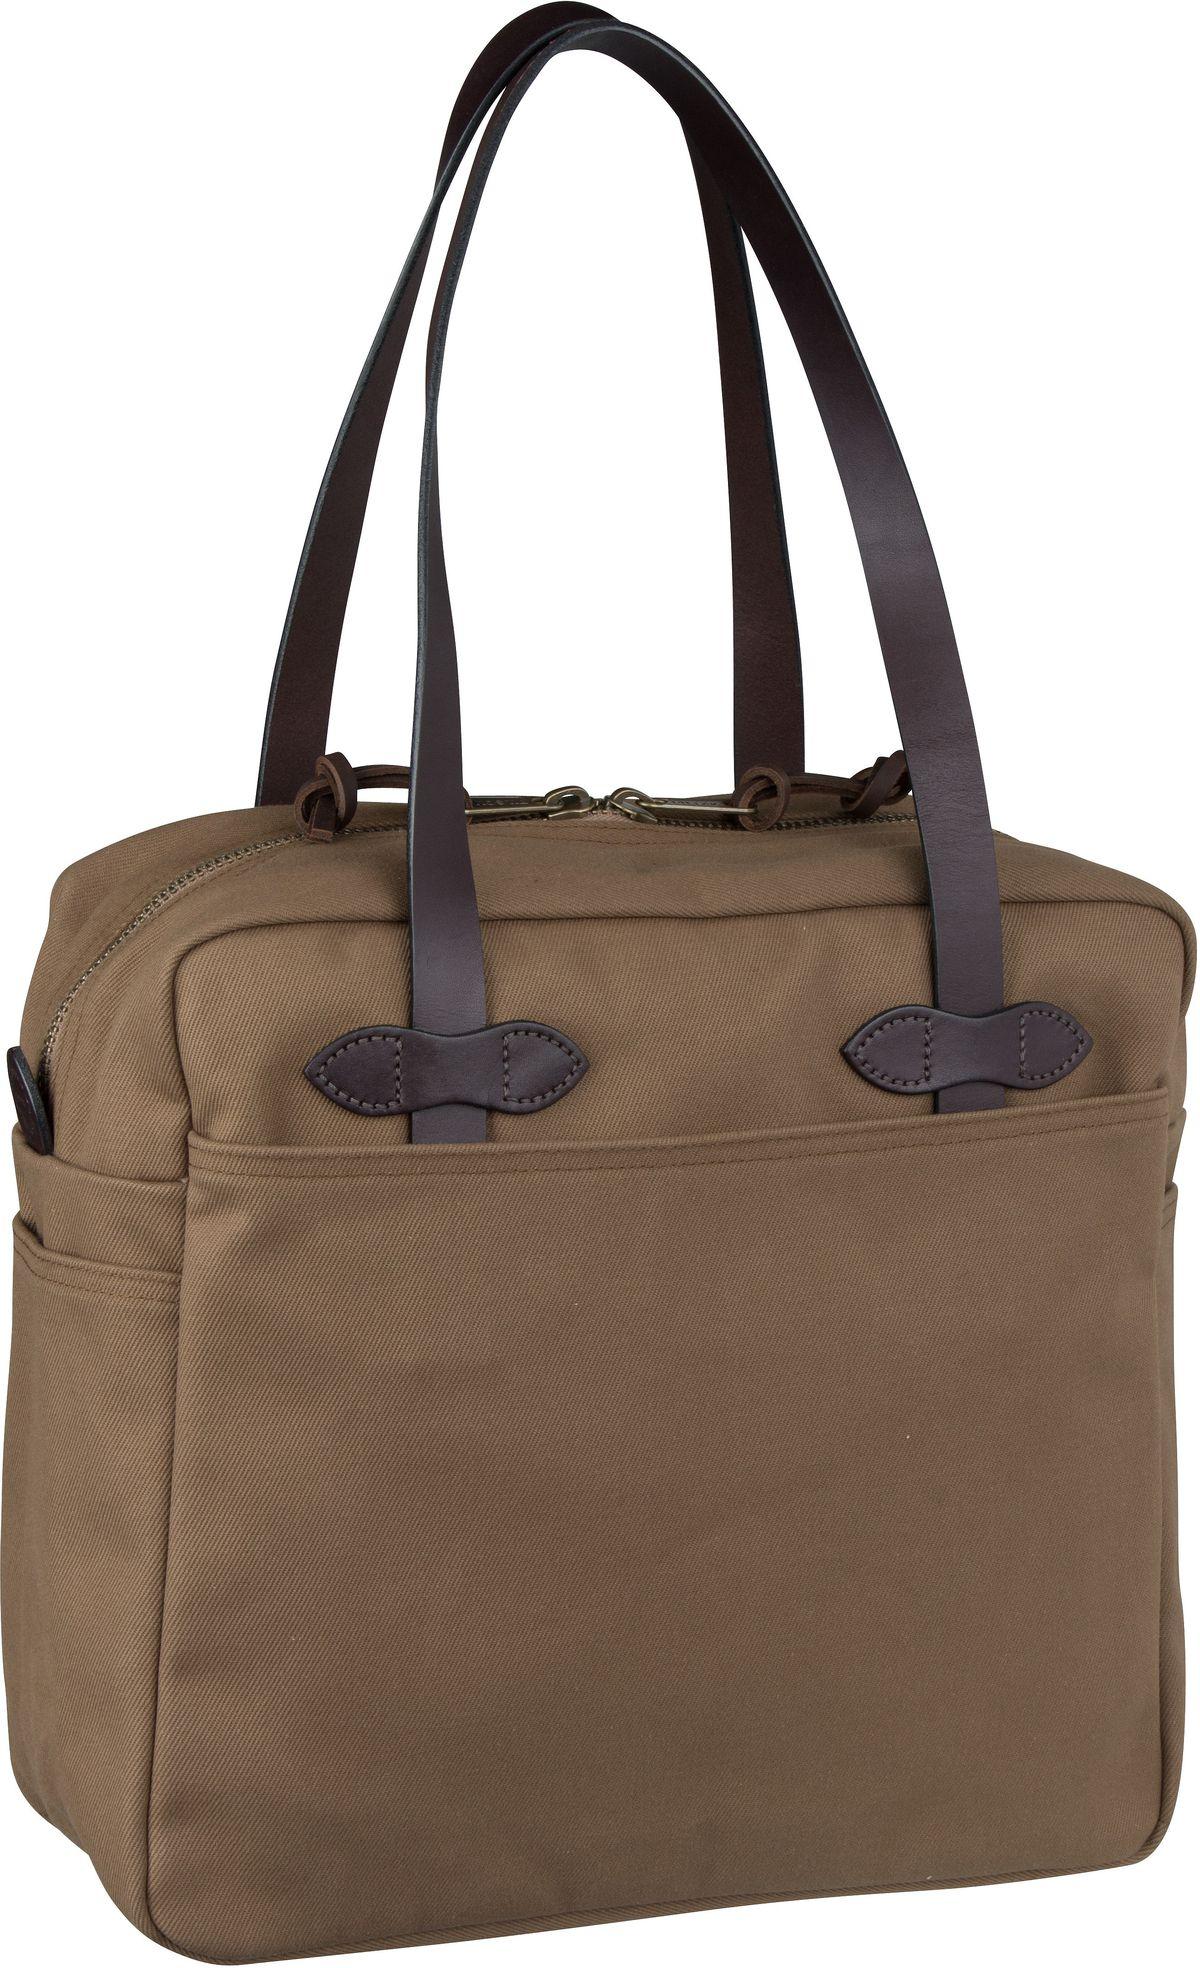 Filson Handtasche Tote Bag with Zipper Sepia (25 Liter)